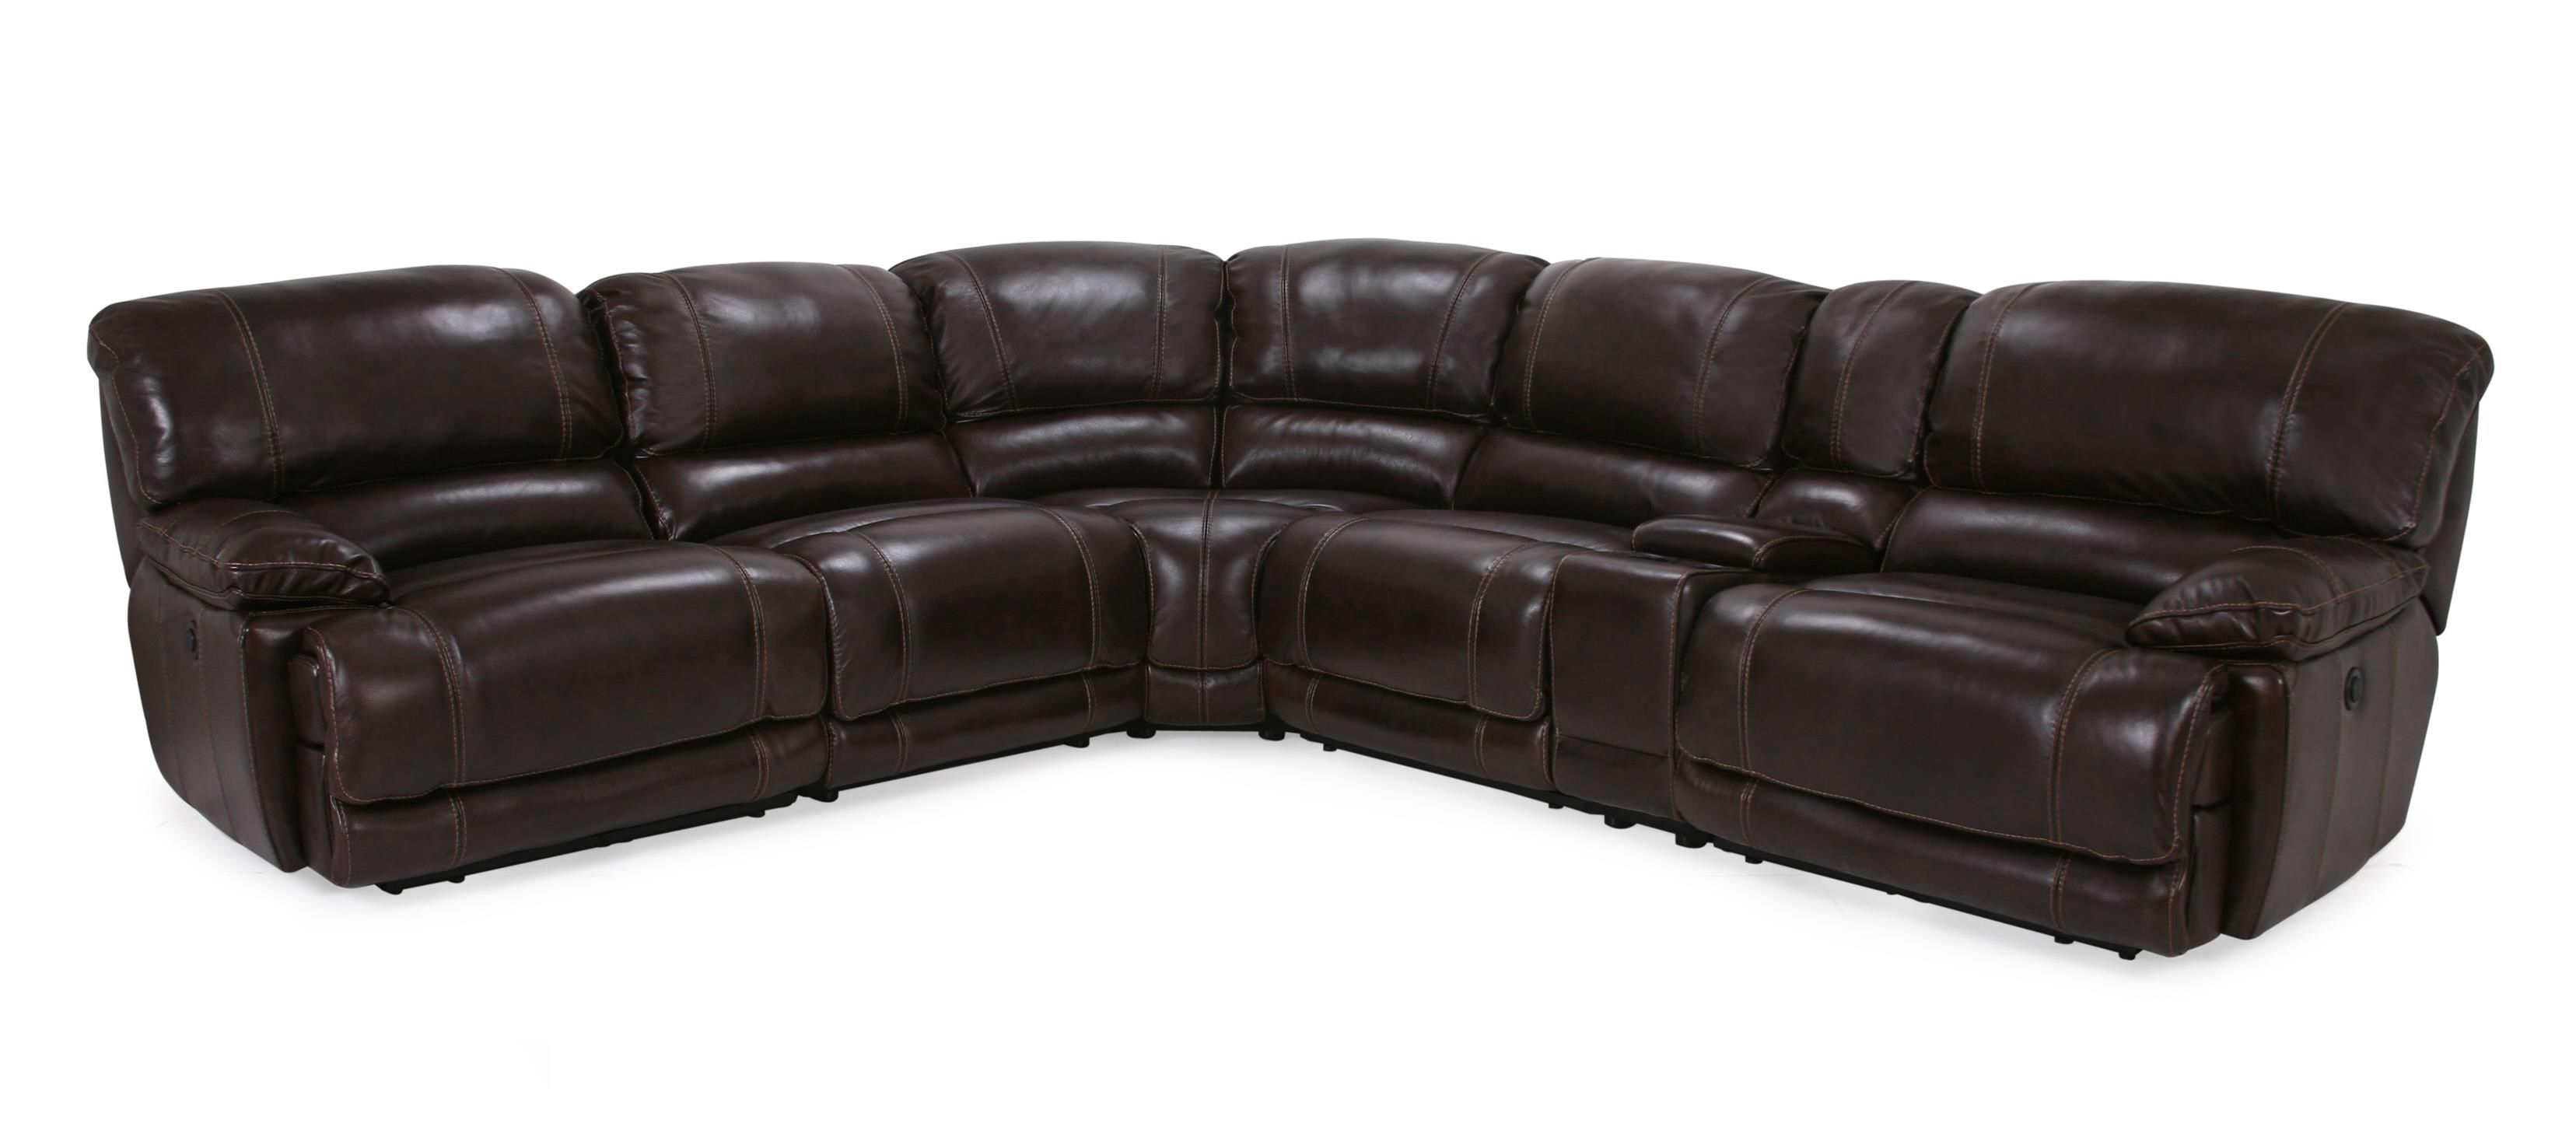 Most Recent 26 Einzigartige Barrington Leder Macht Reclining Sofa #leder (View 16 of 20)